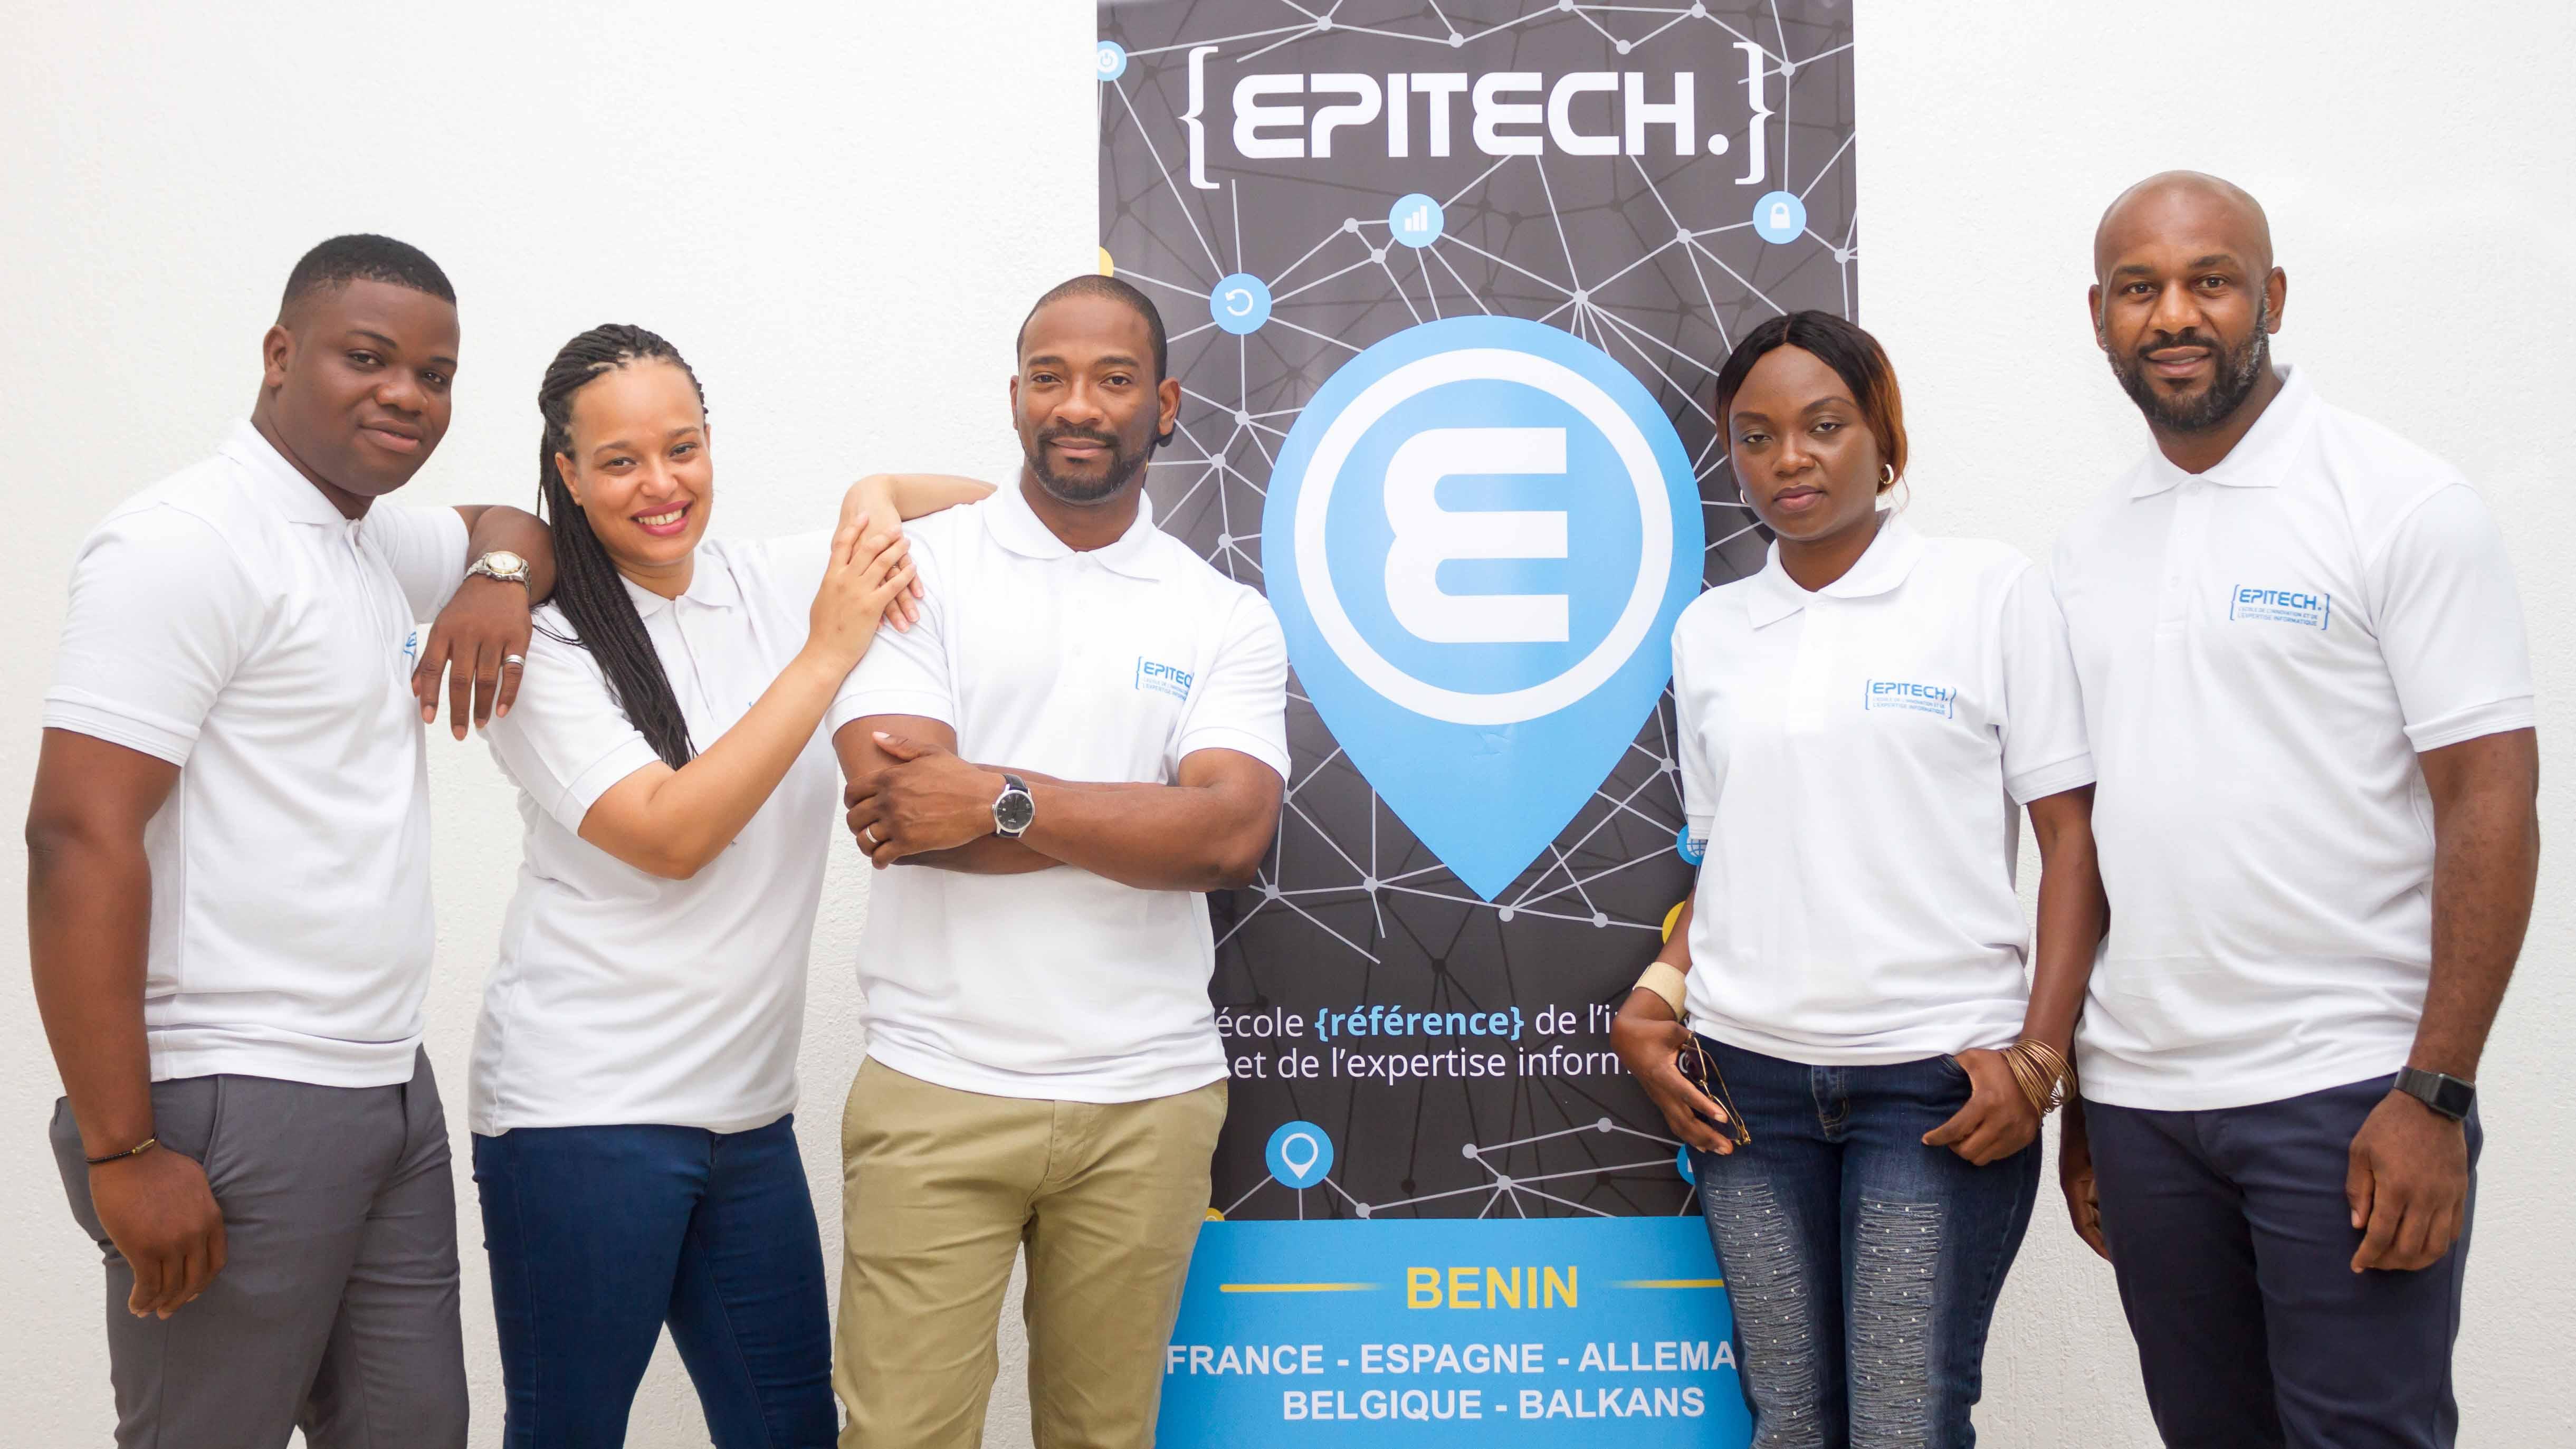 Epitech au Bénin